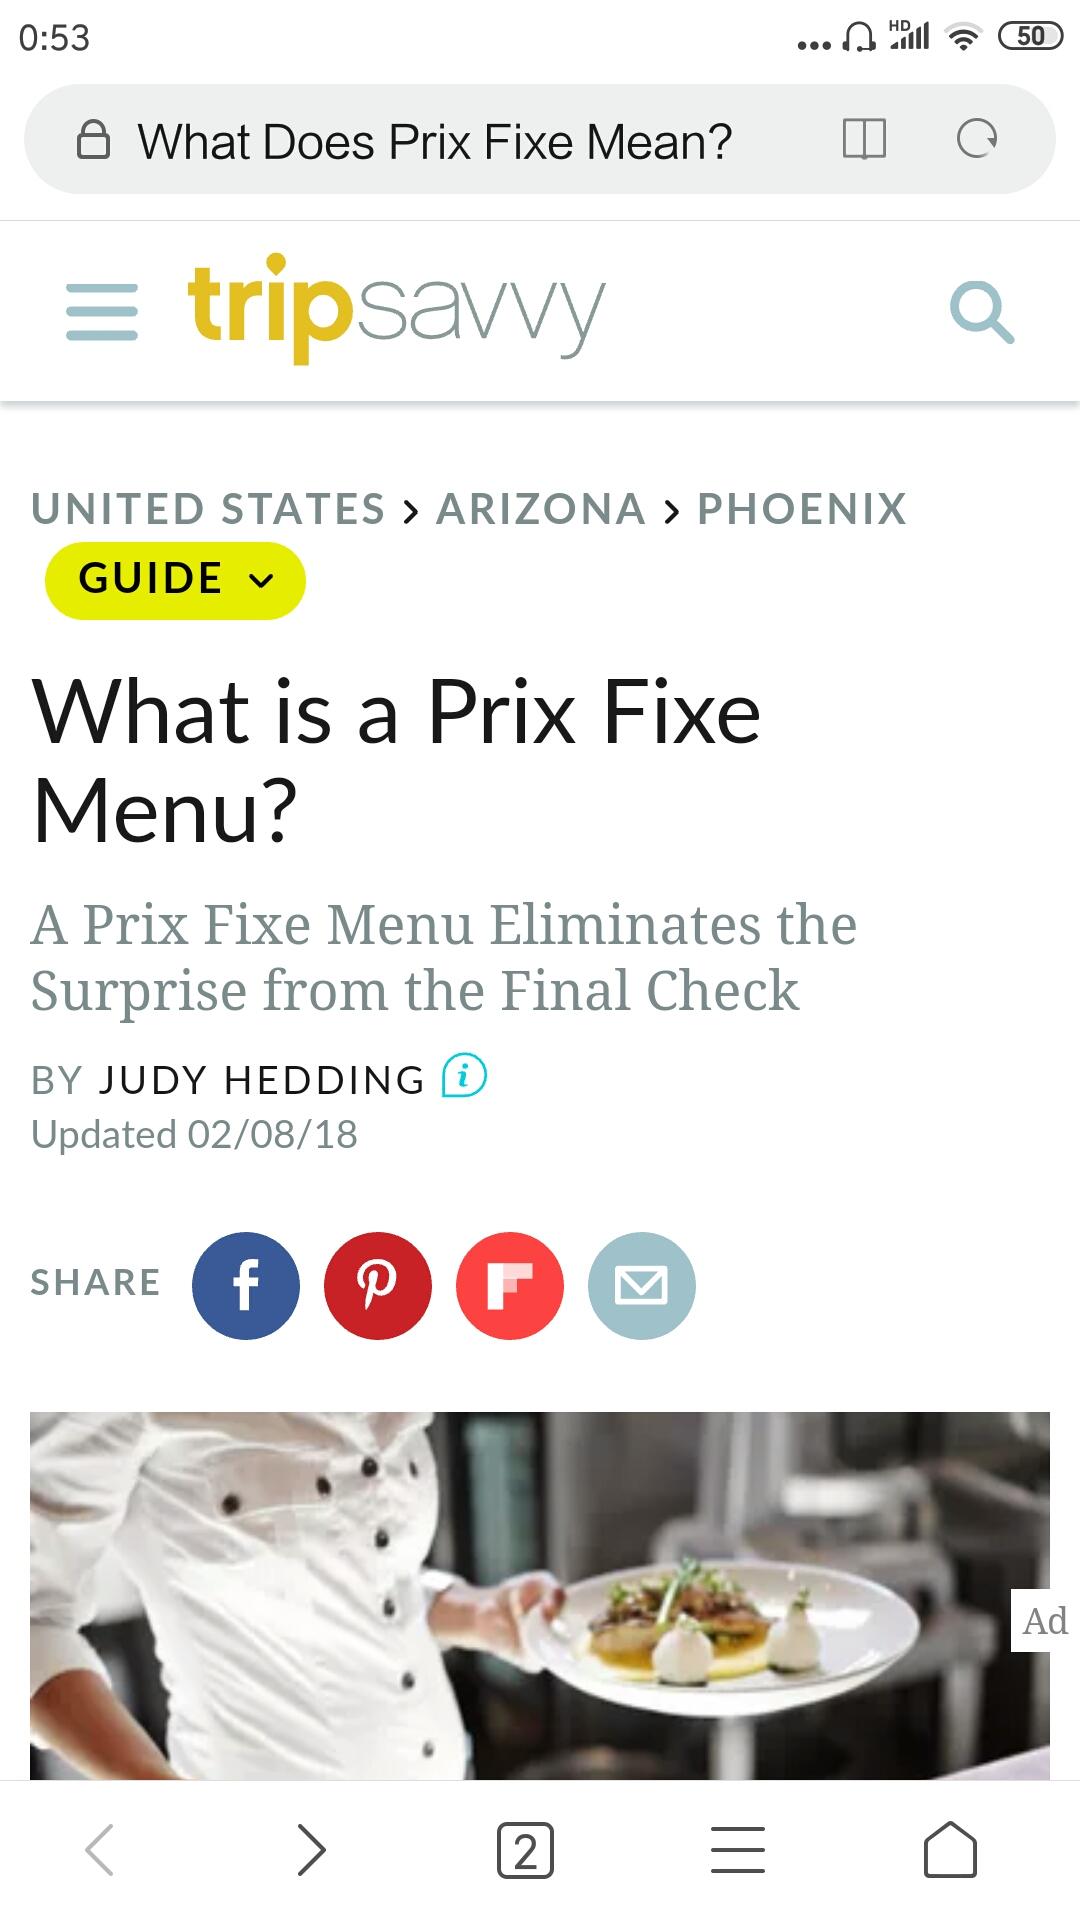 What is a Prix Fixe Menu?什么是Prix Fixe菜单